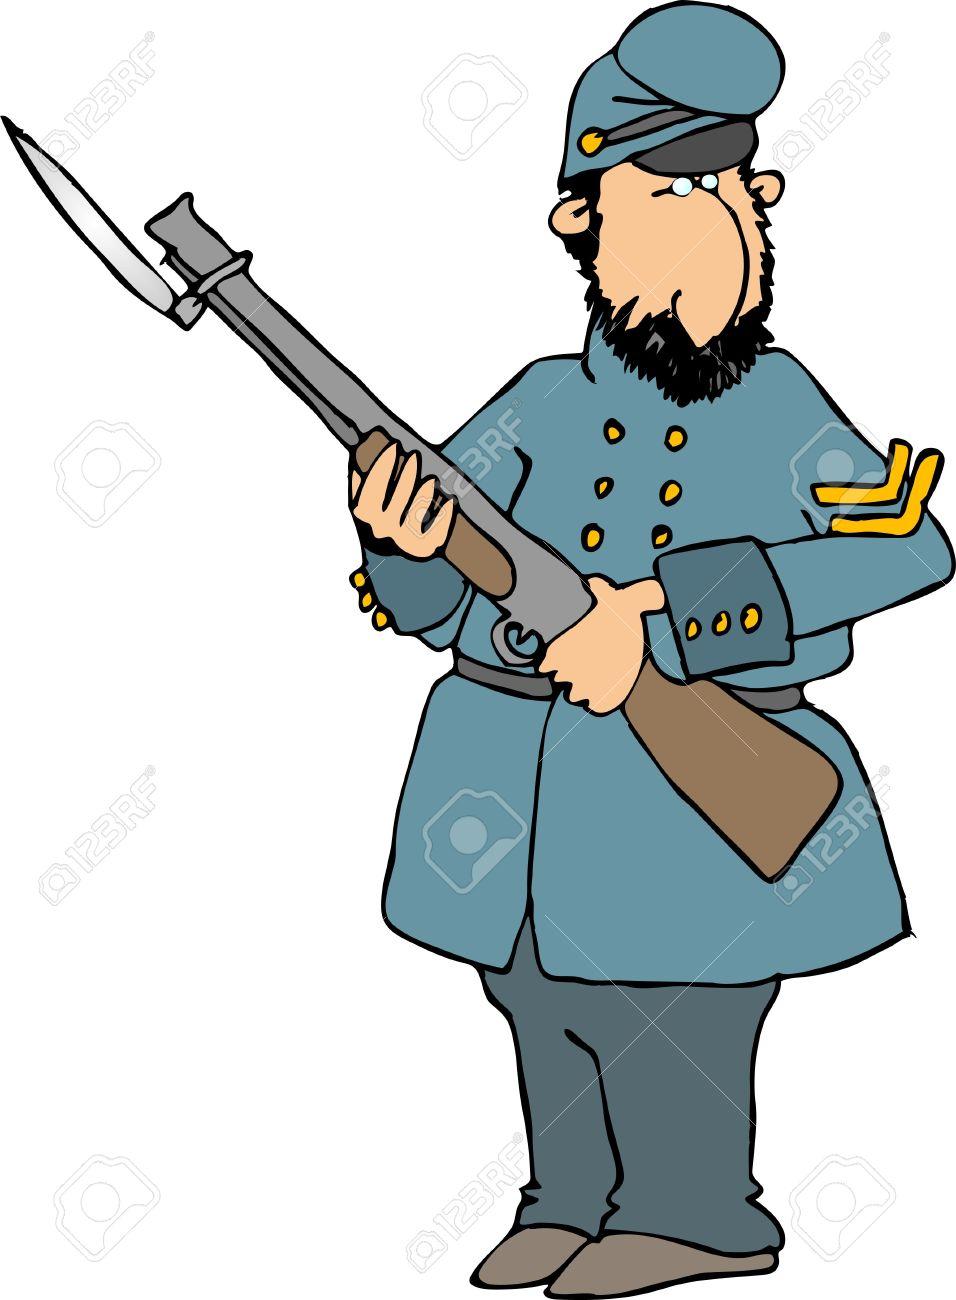 Civil war soldier clipart 2 » Clipart Station.